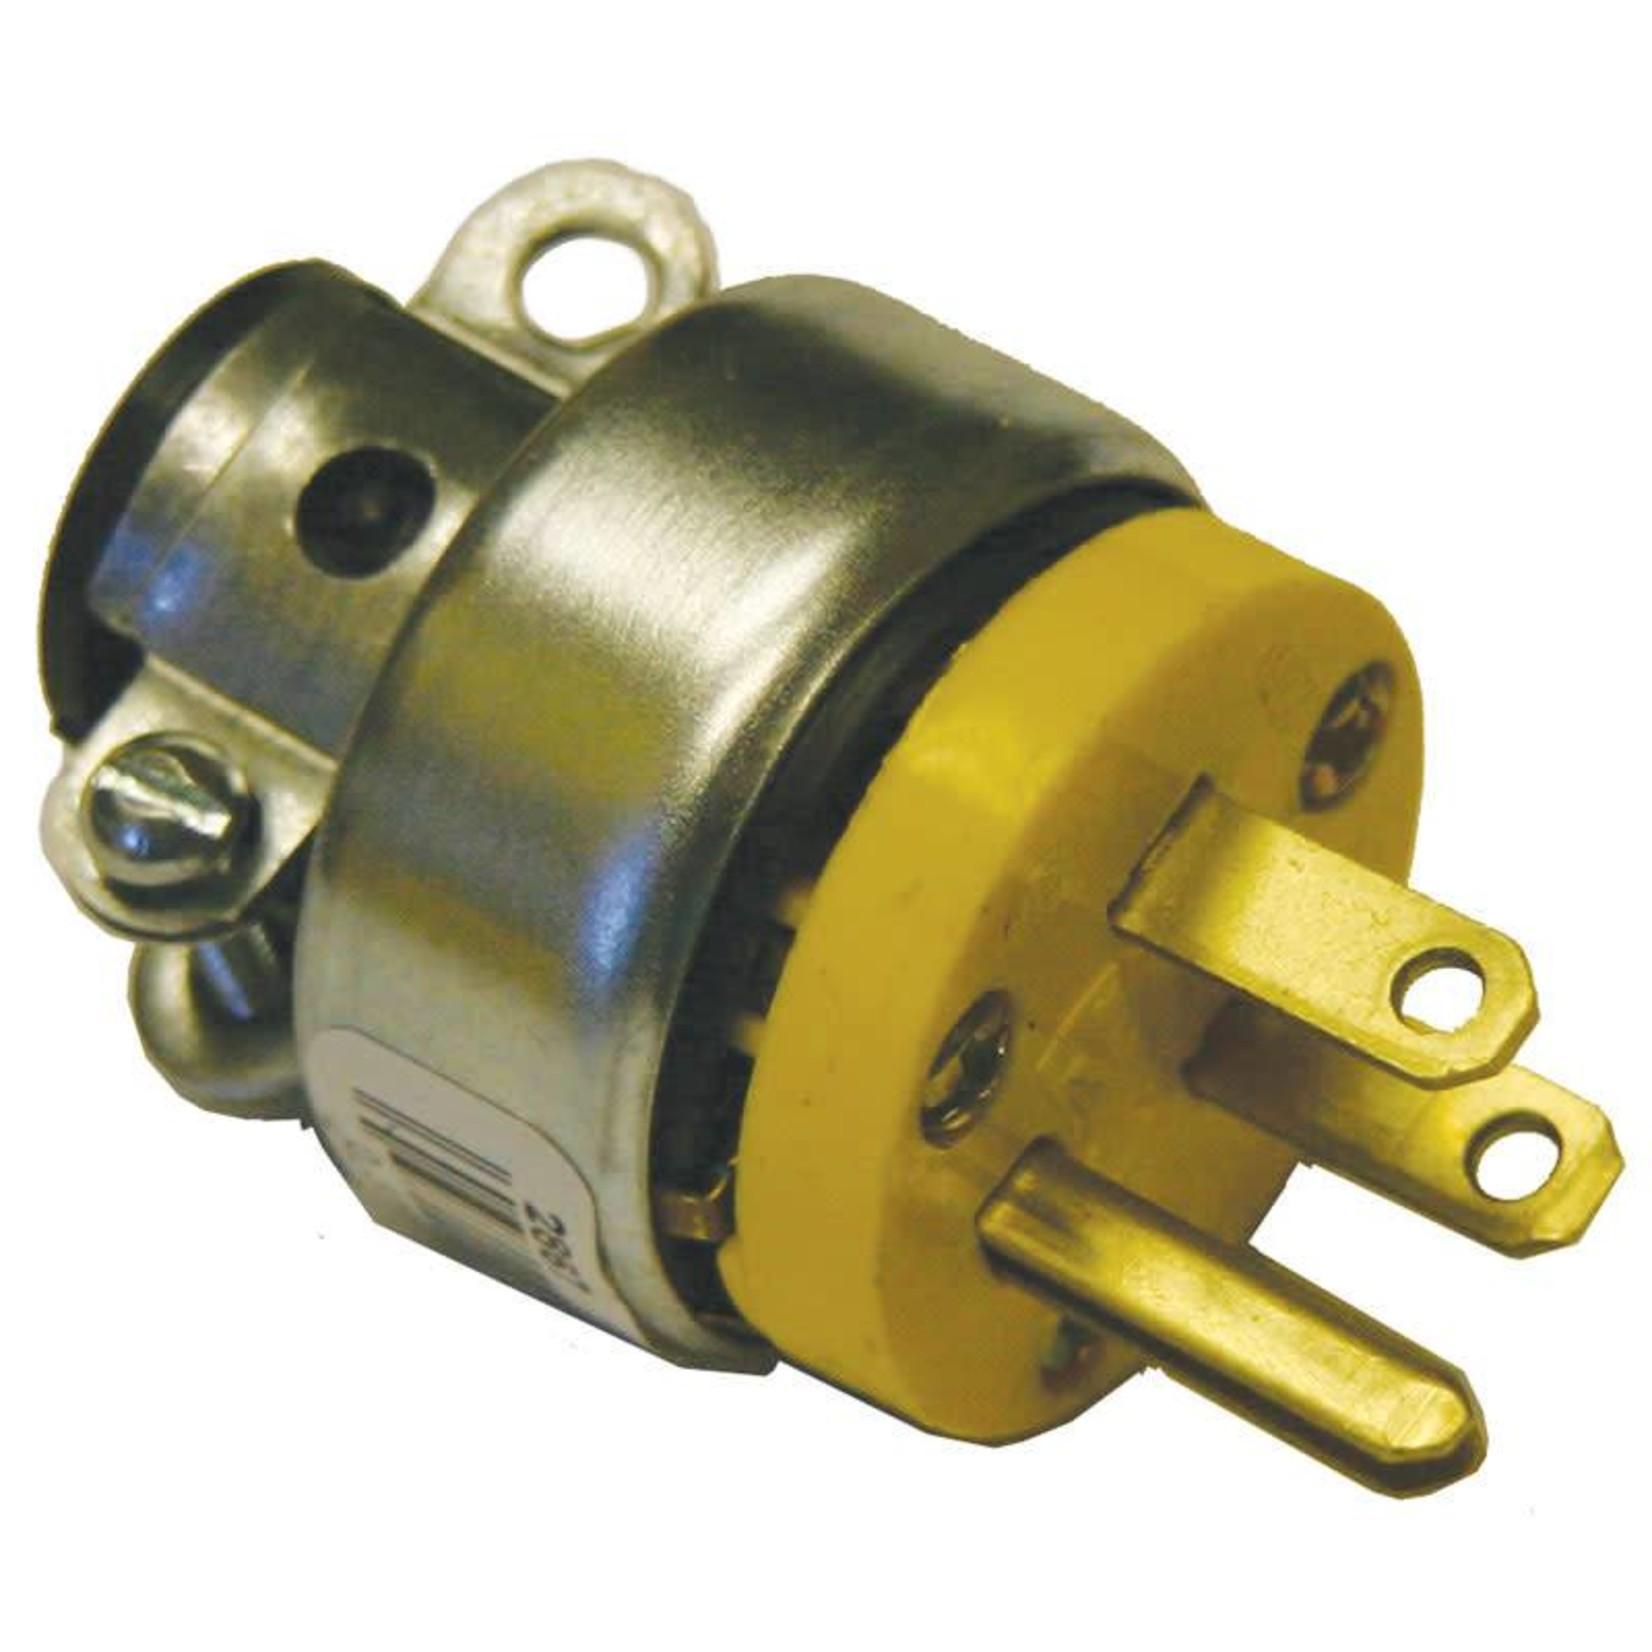 Generic CVS Round Plug, Metal Shielded - Male 3-Wire